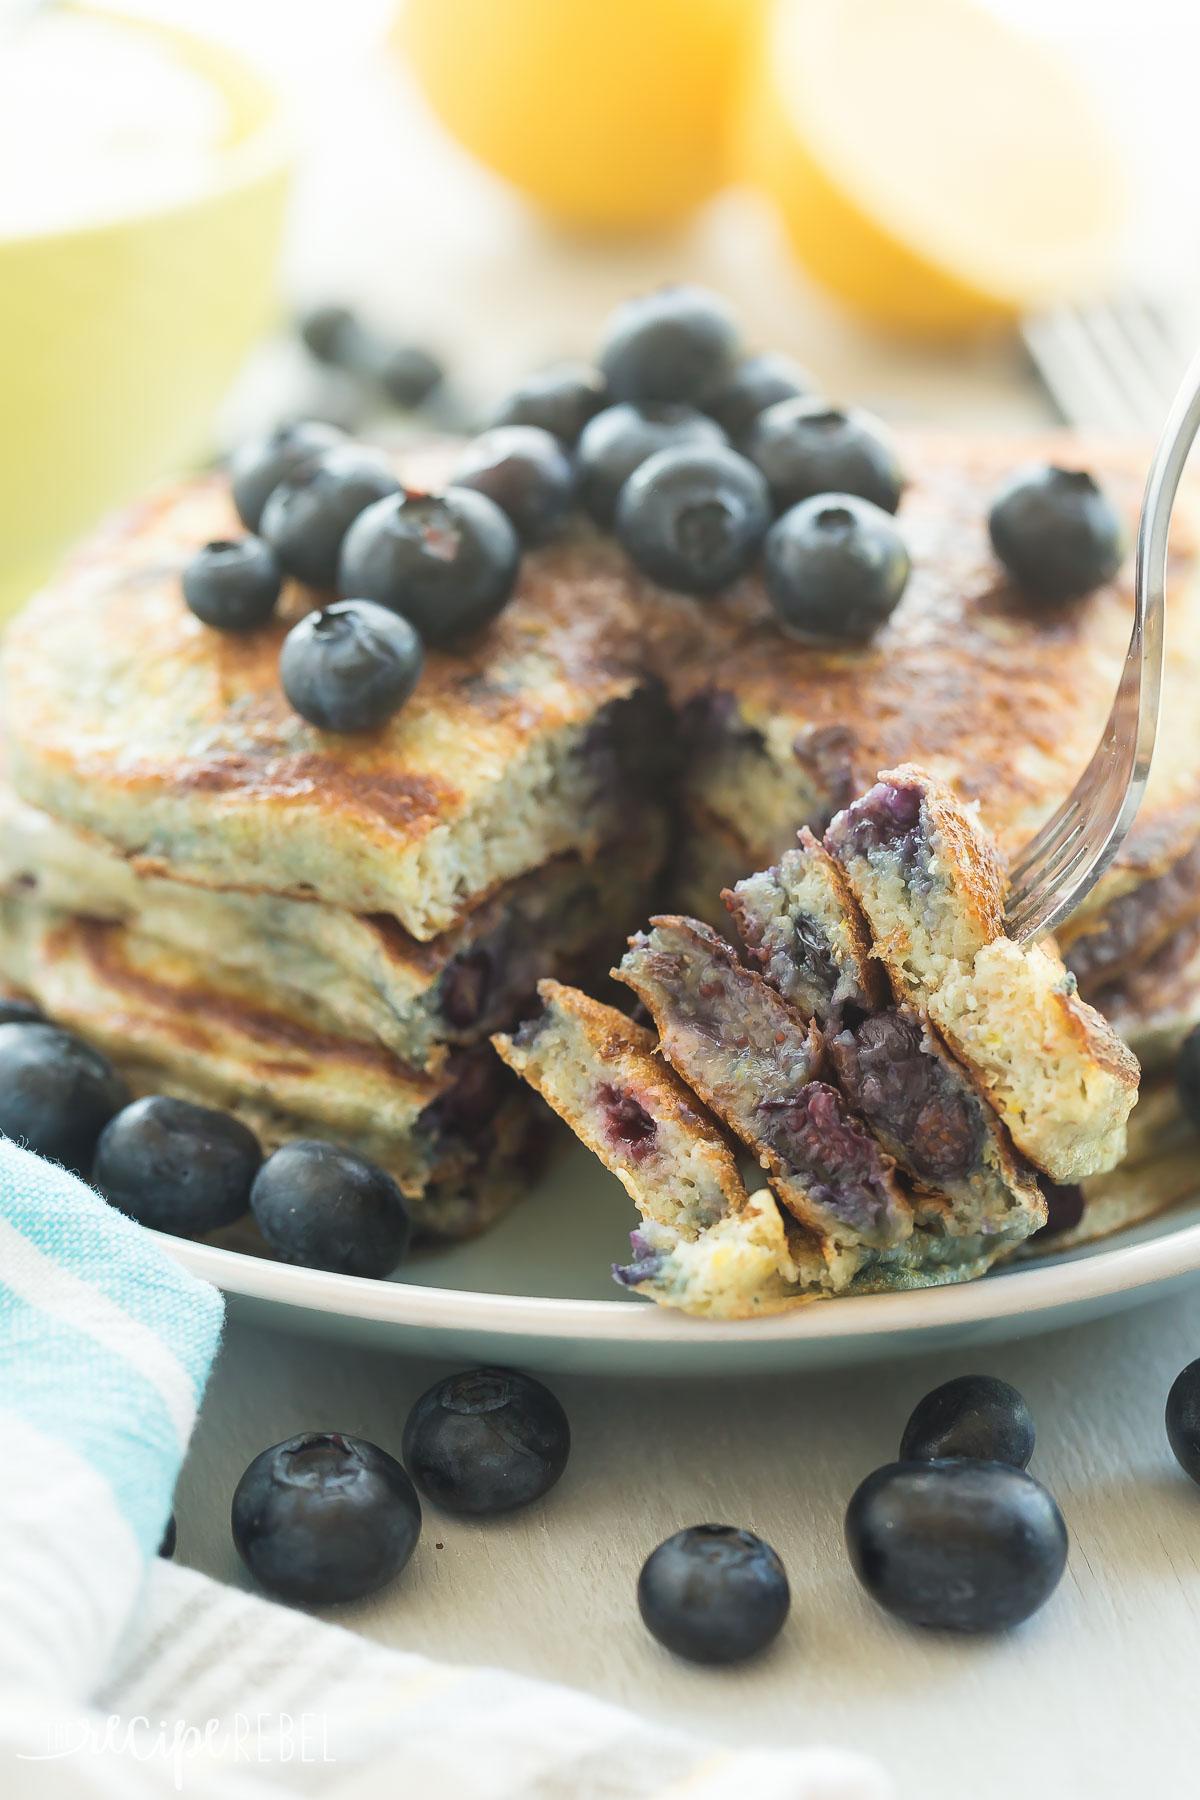 lemon-blueberry-greek-yogurt-pancakes-www-thereciperebel-com-7-of-9